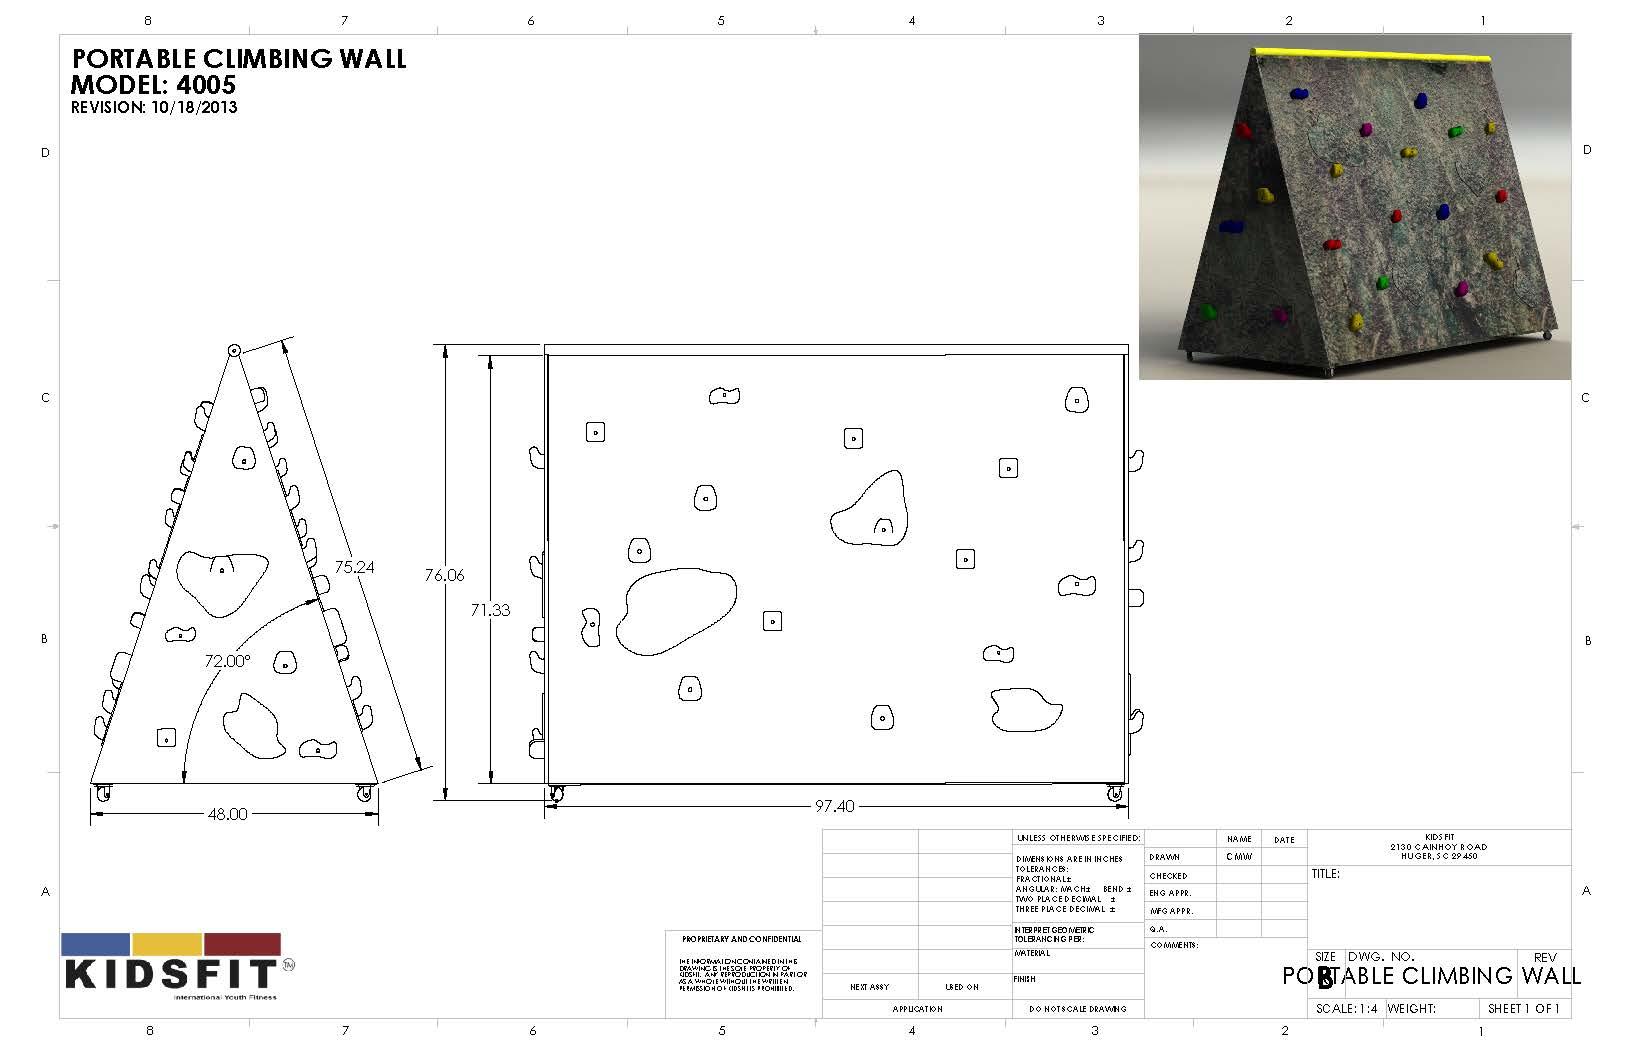 PORTABLE_CLIMBING_WALL_2.jpg